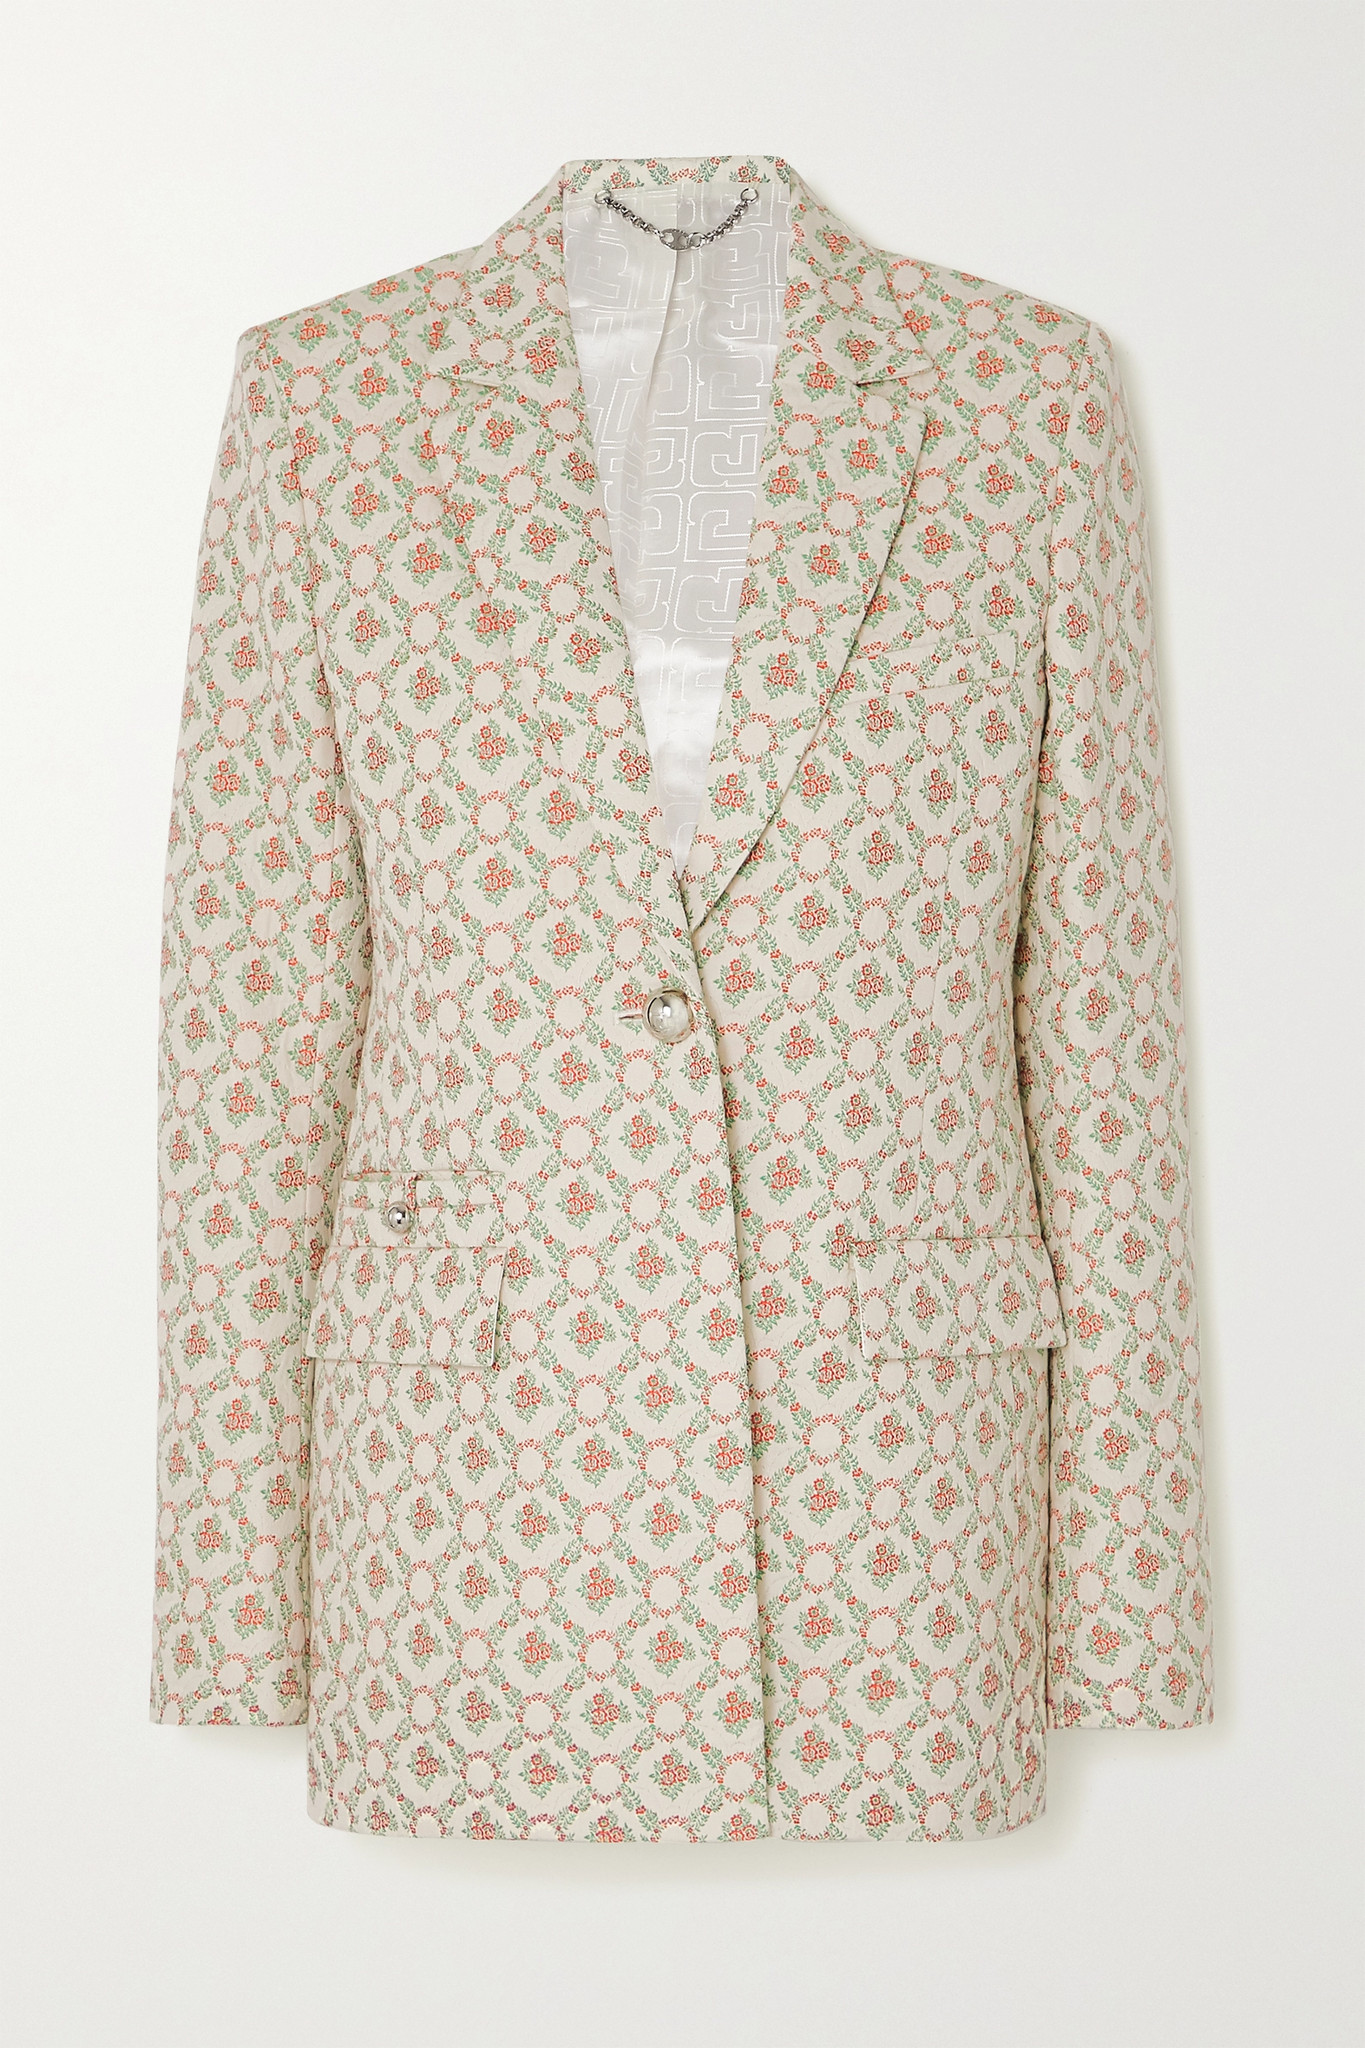 PACO RABANNE - 绗缝棉质混纺花卉提花西装外套 - 中性色 - FR38